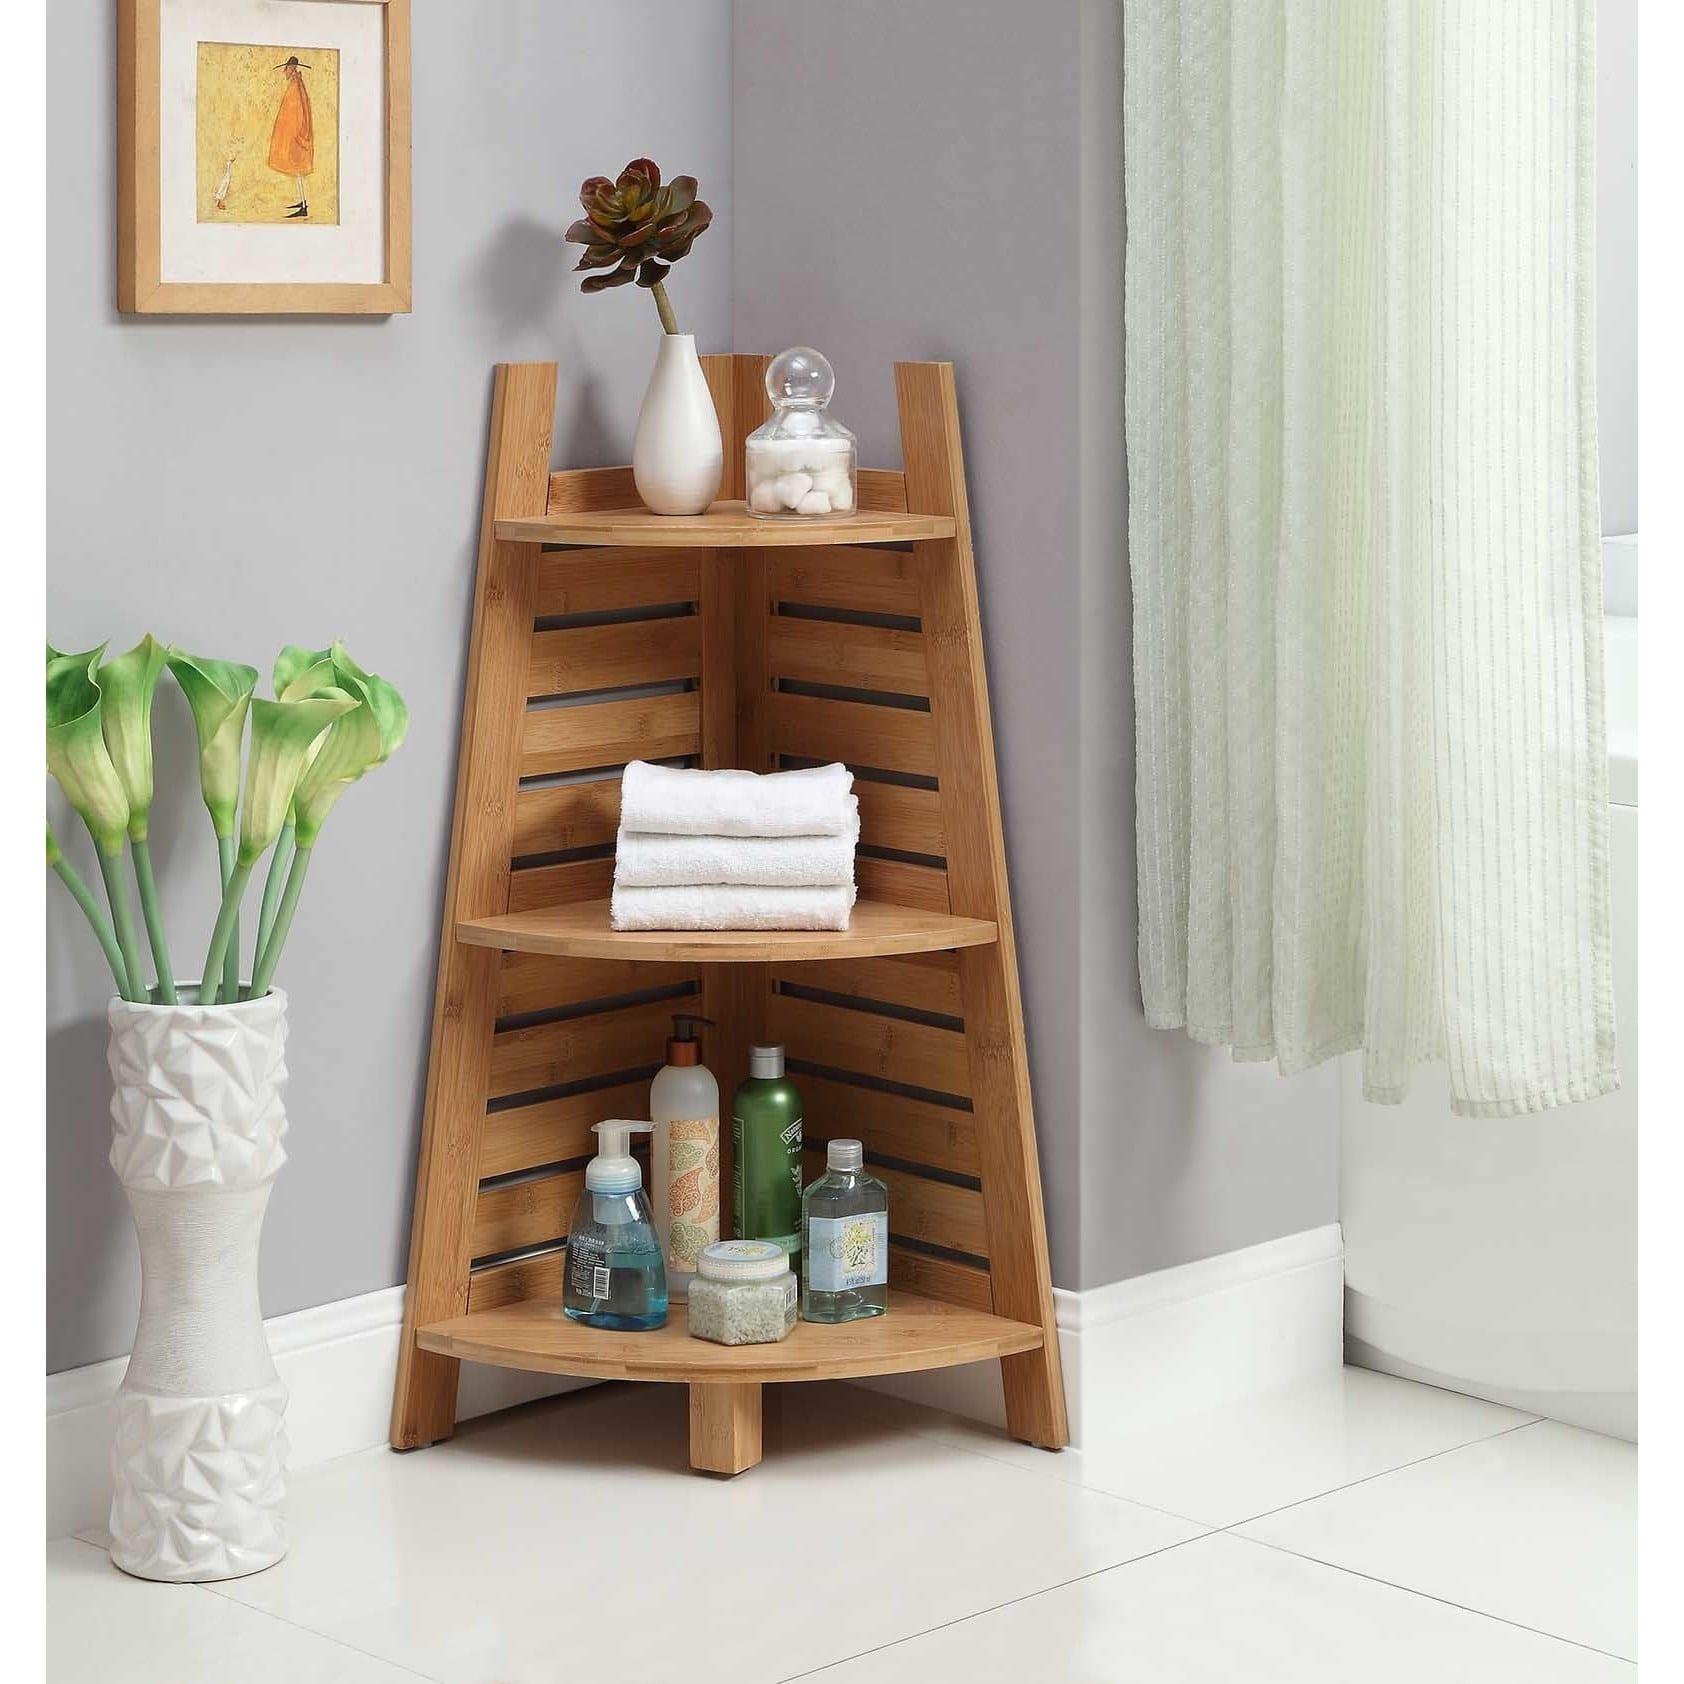 Buy Bracken Bamboo Corner Shelf - On Sale - Free Shipping Today LCYDHRZ